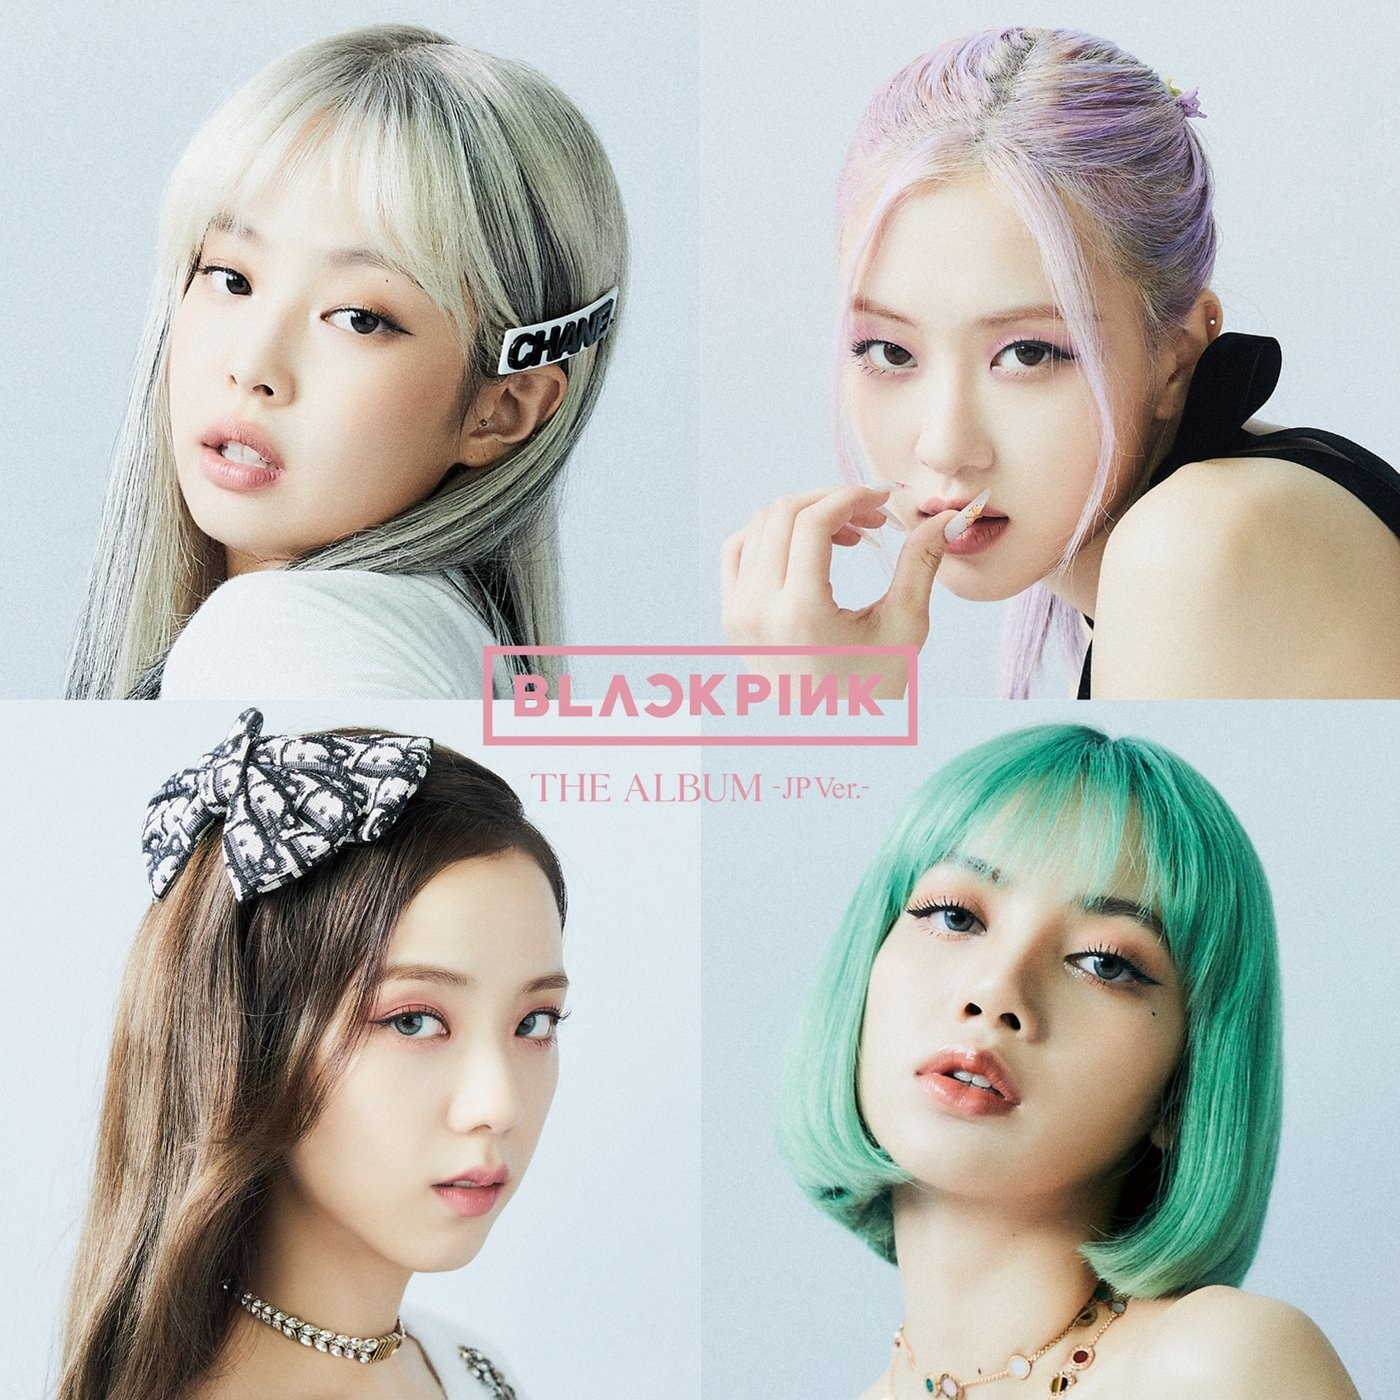 [Album] BLACKPINK – THE ALBUM (Japan Version) [24bit Lossless + MP3 320 / WEB] [2021.08.03]